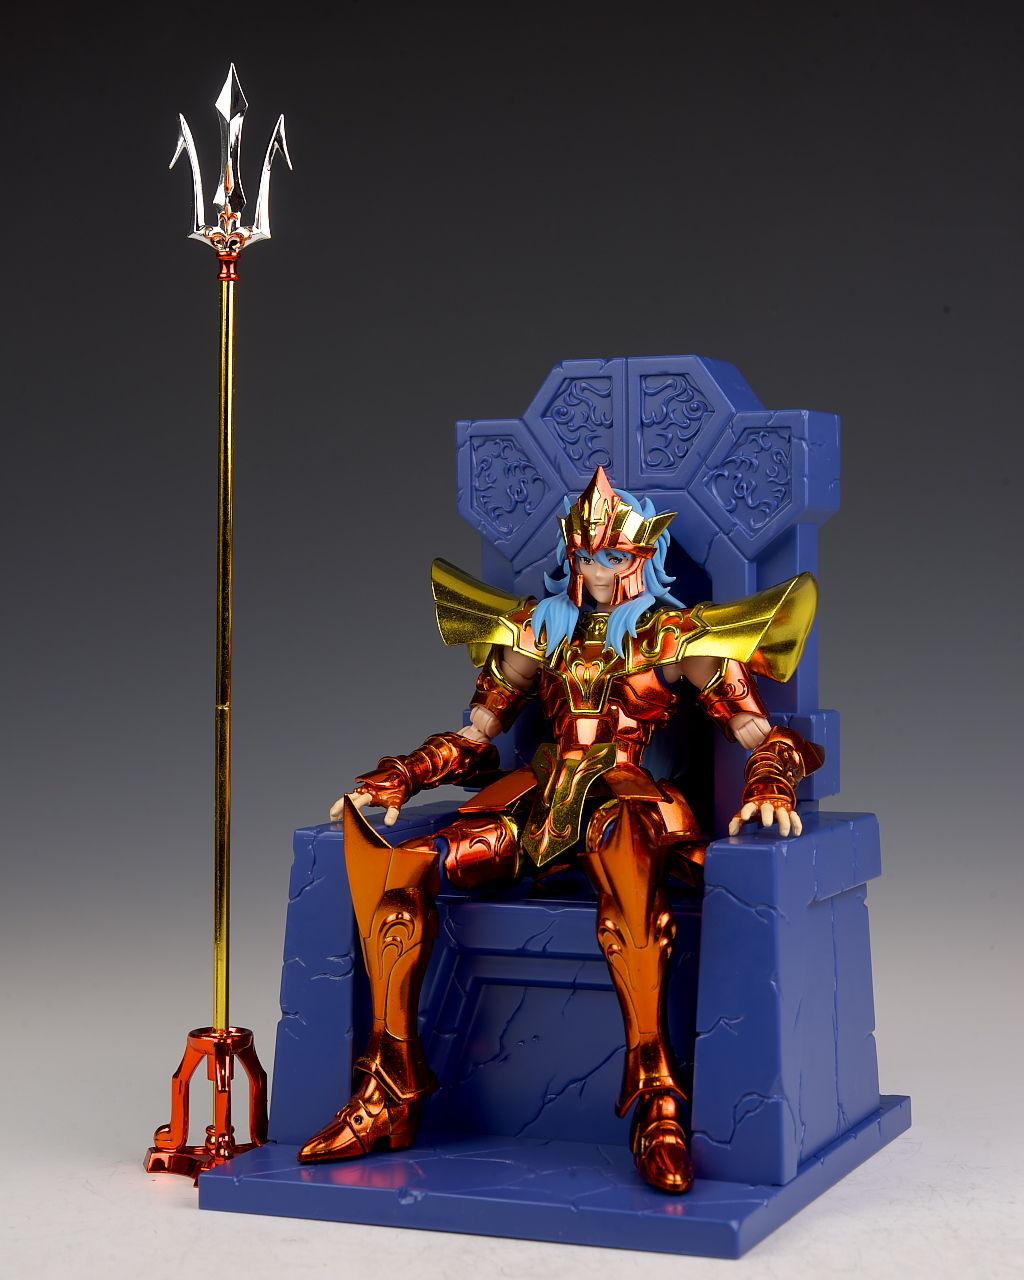 [Imagens] Poseidon EX & Poseidon EX Imperial Throne Set 7GavekaJ_o